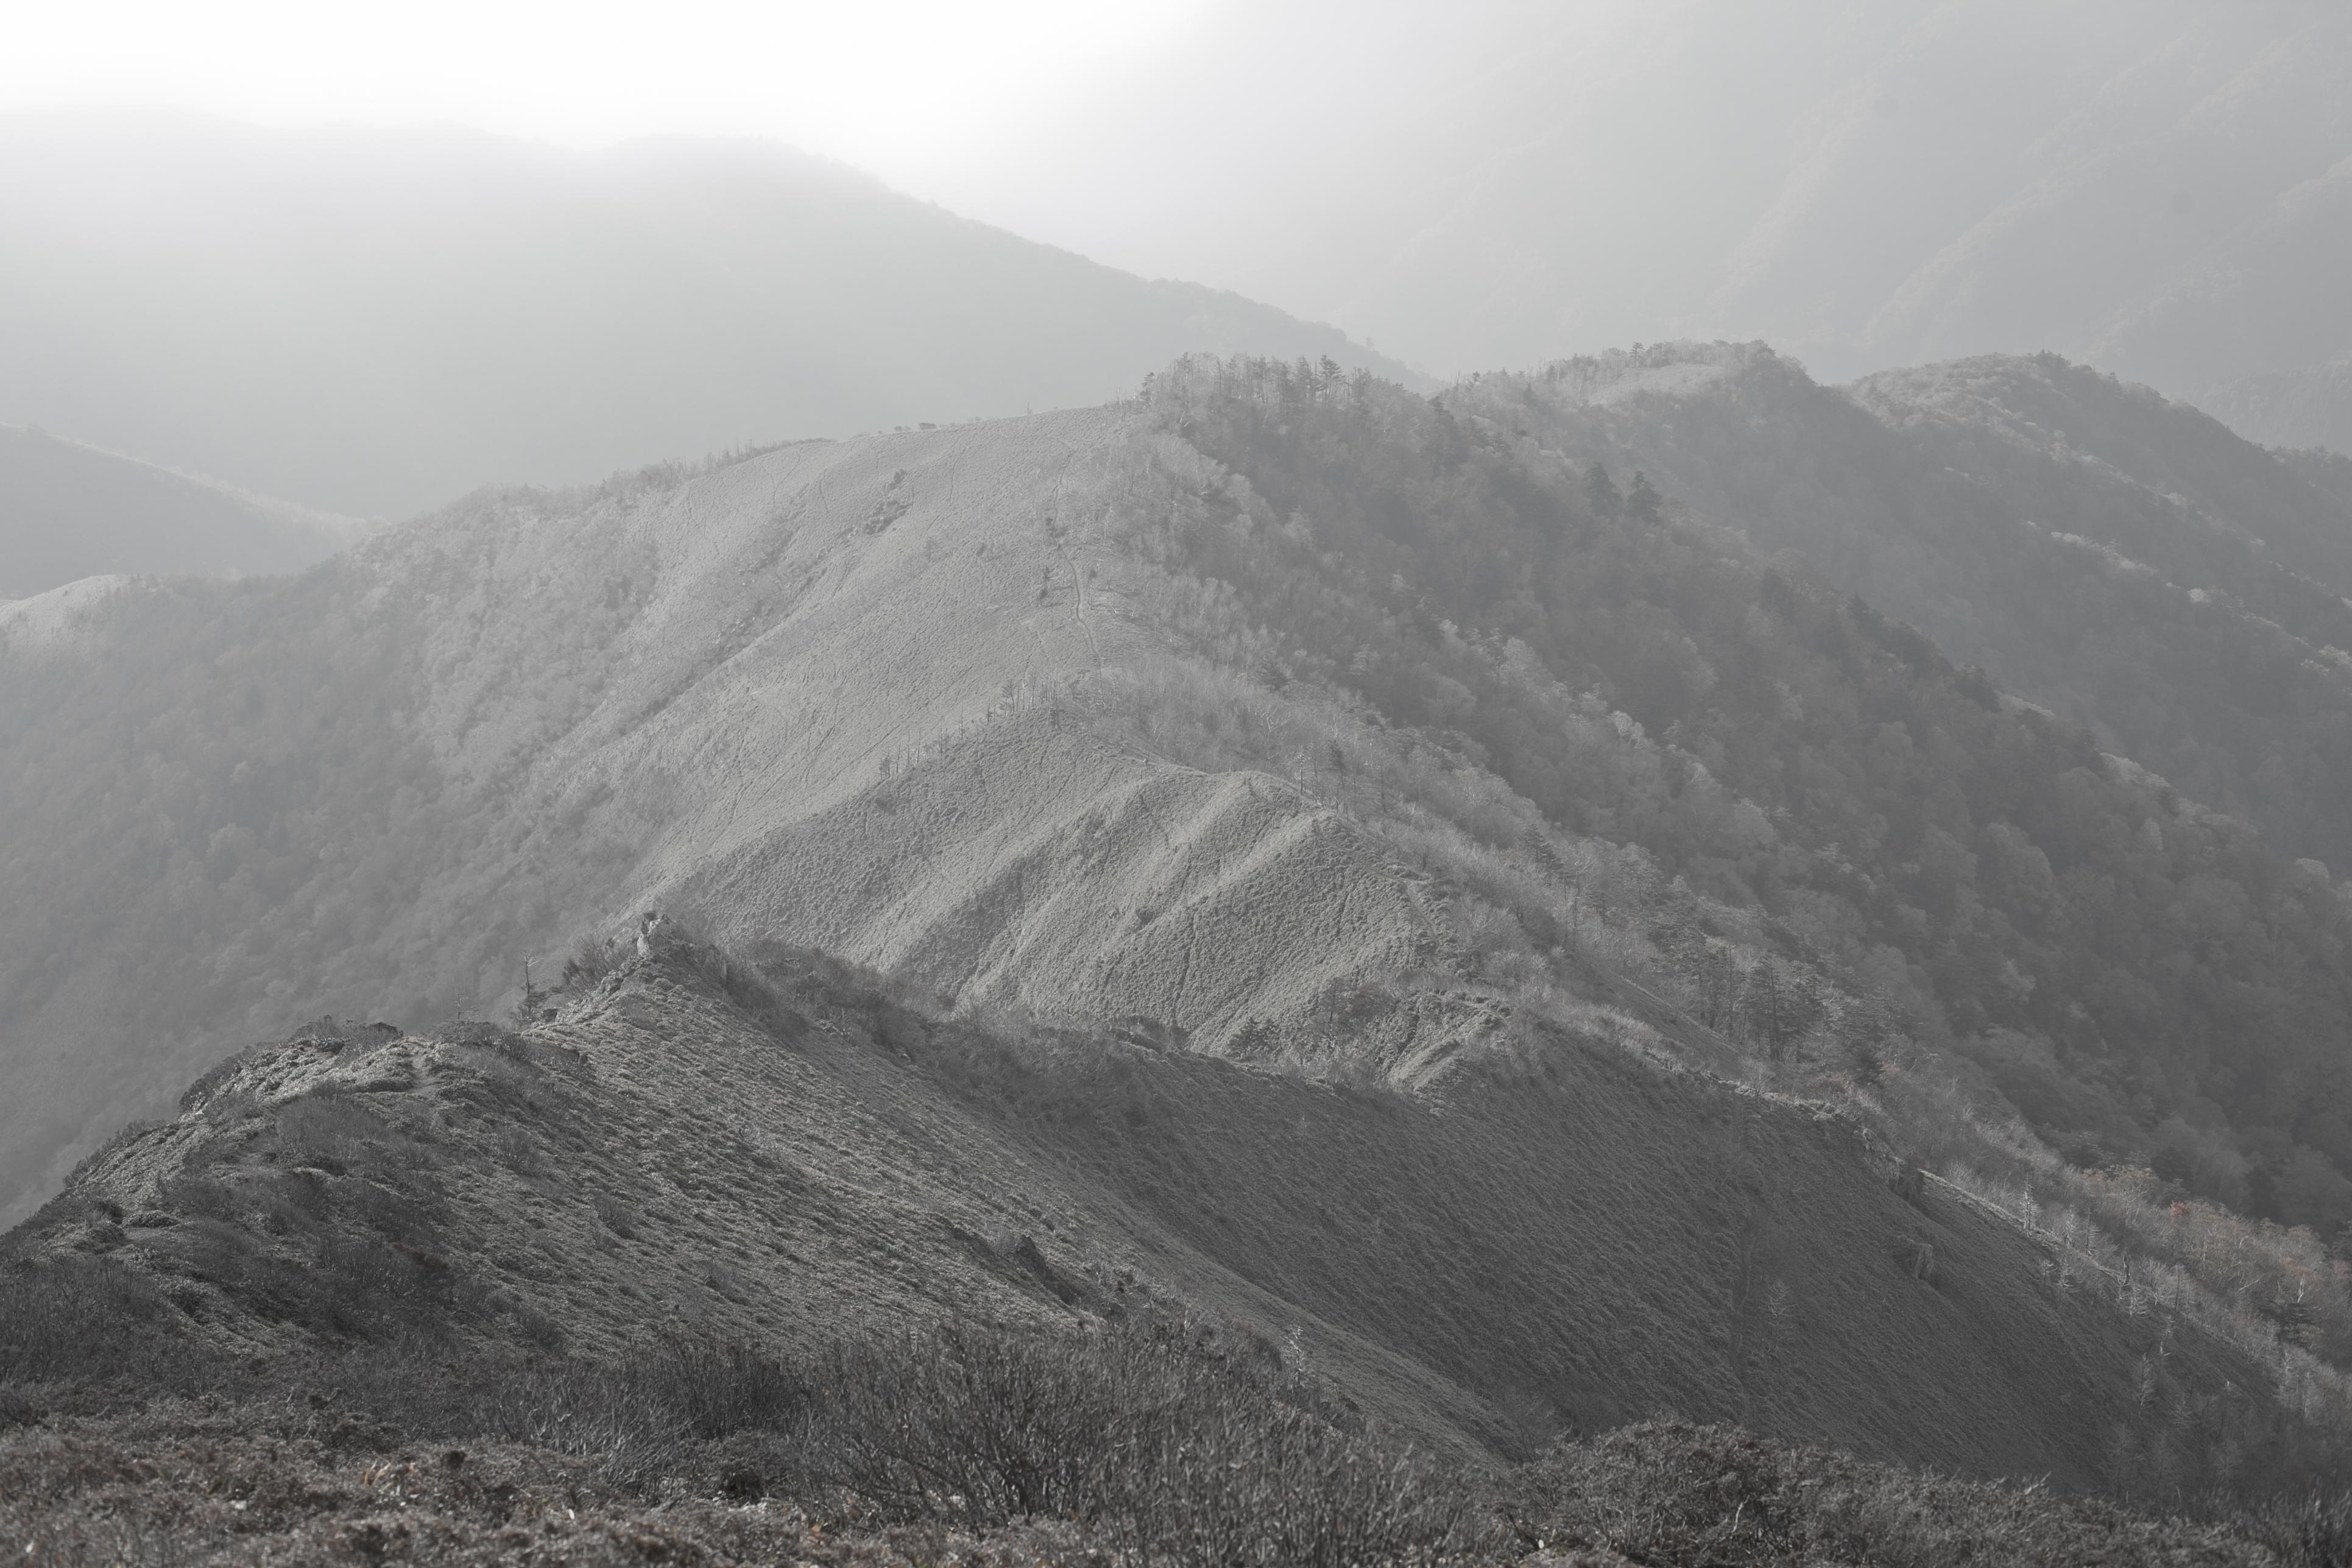 四国徳島 剣山と次郎笈登山3回目 2011年10月16日